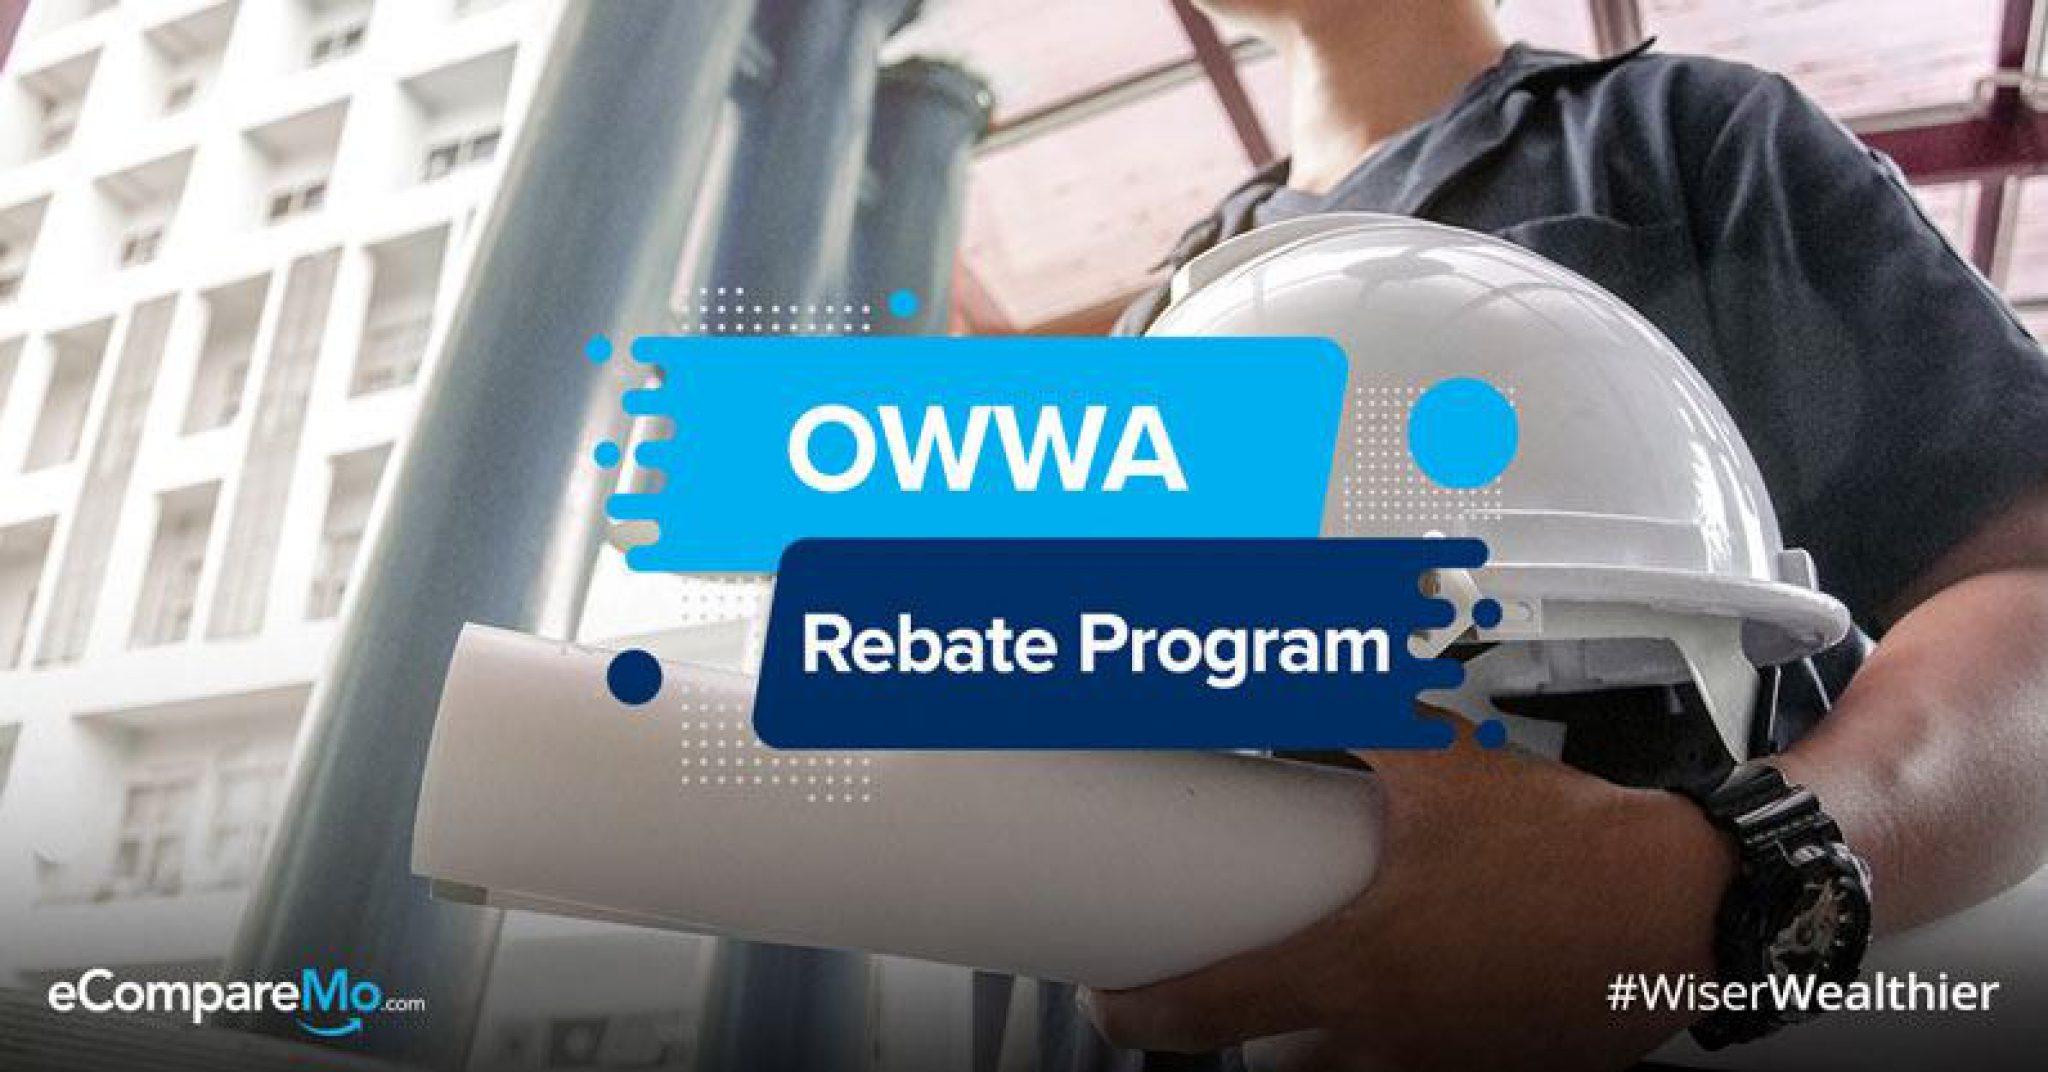 OWWA Rebate Program